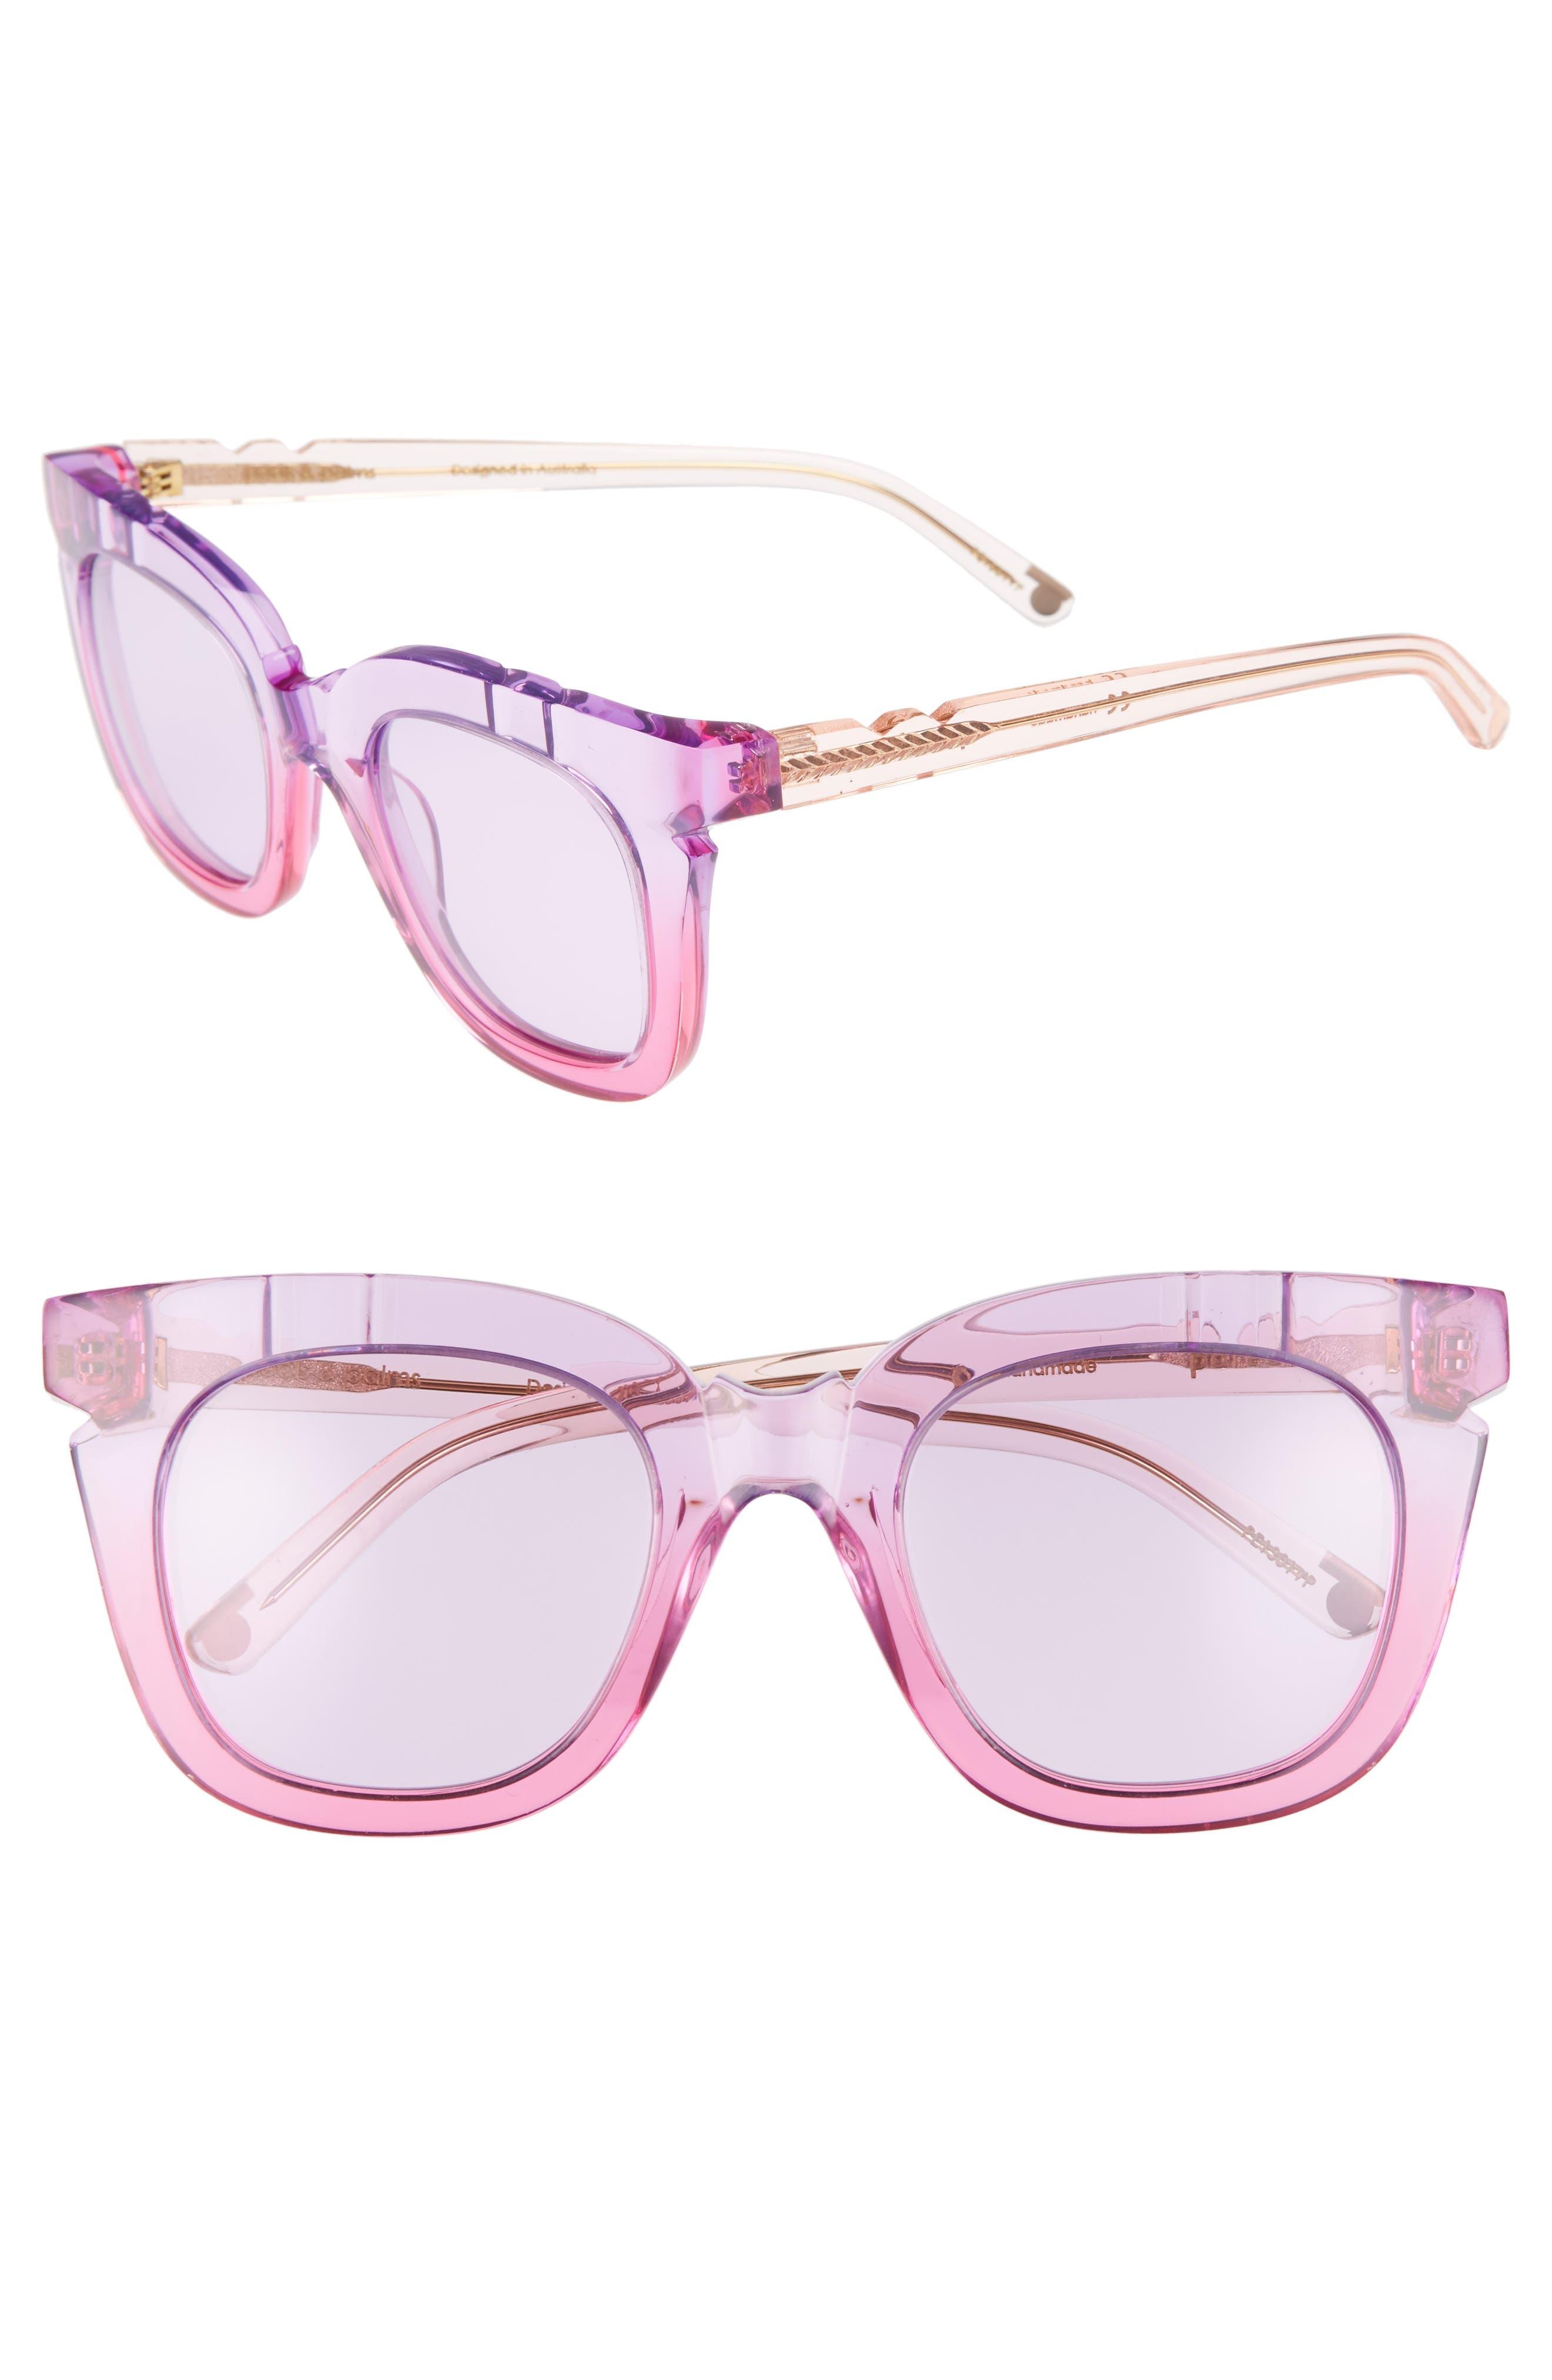 Pools & Palms 50mm Sunglasses,                         Main,                         color, 650